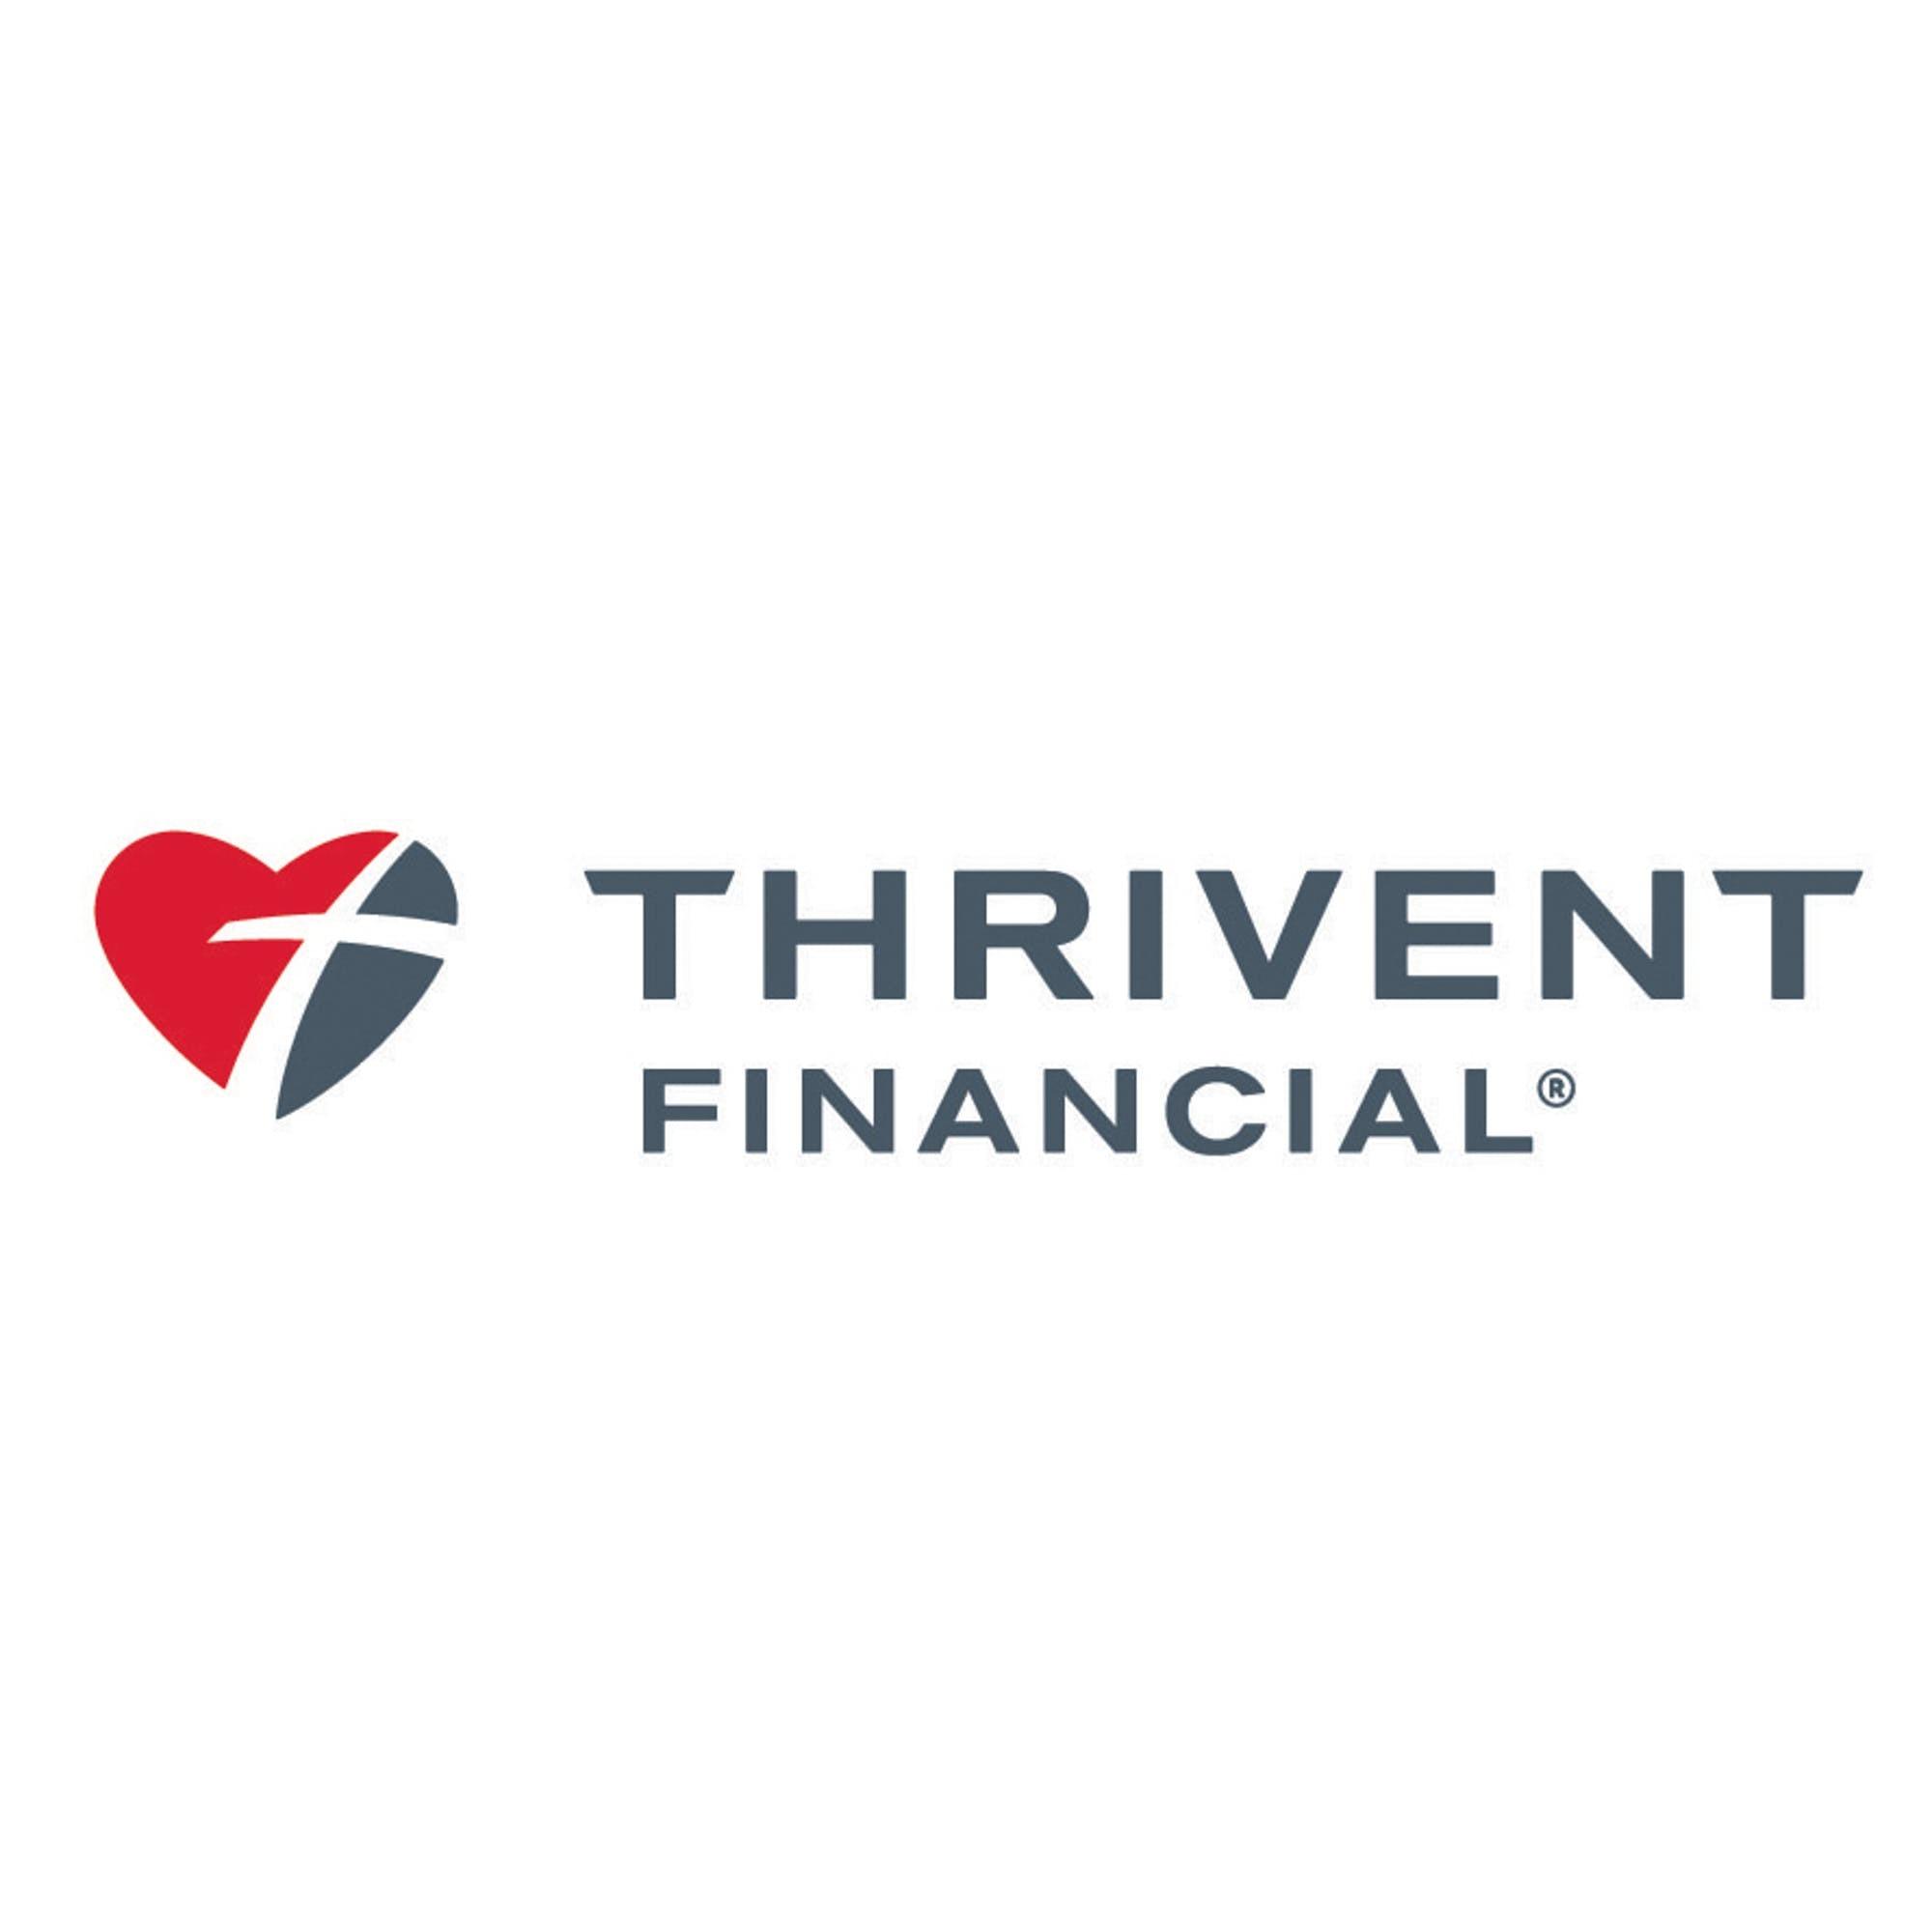 Thrivent Financial - Brittany Lawson